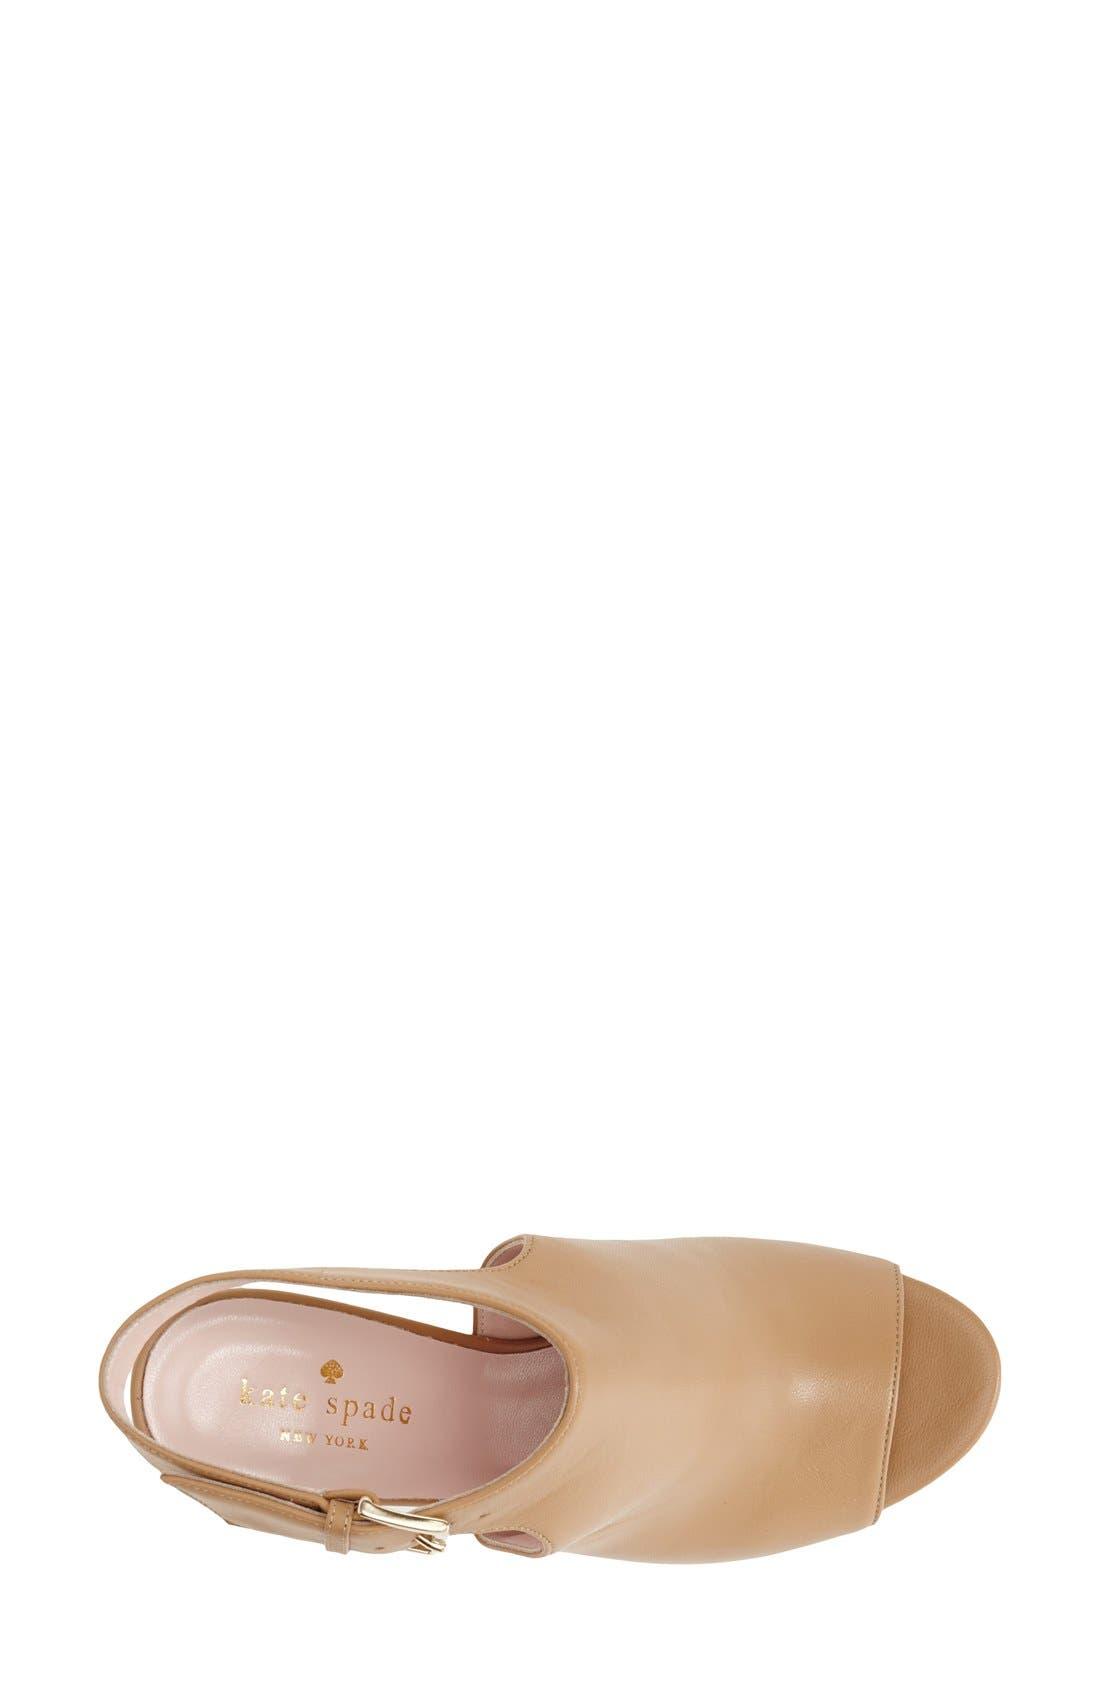 'ingrada' slingback sandal,                             Alternate thumbnail 6, color,